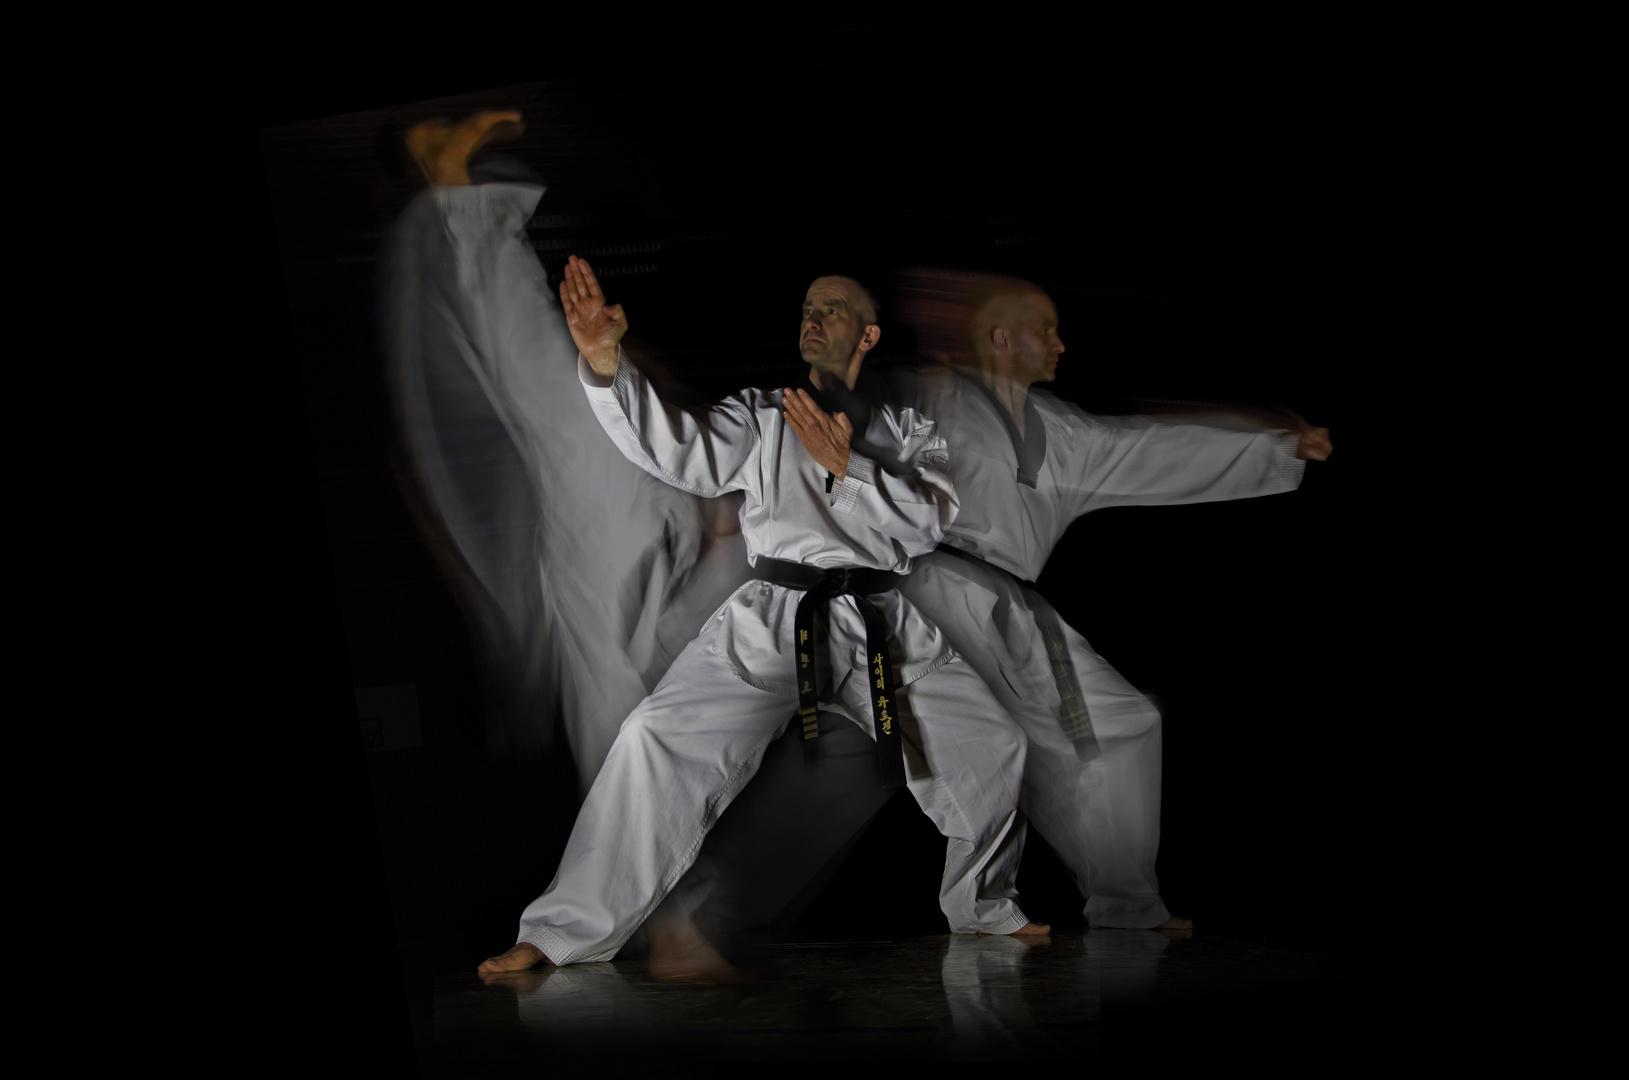 - Taekwondo -